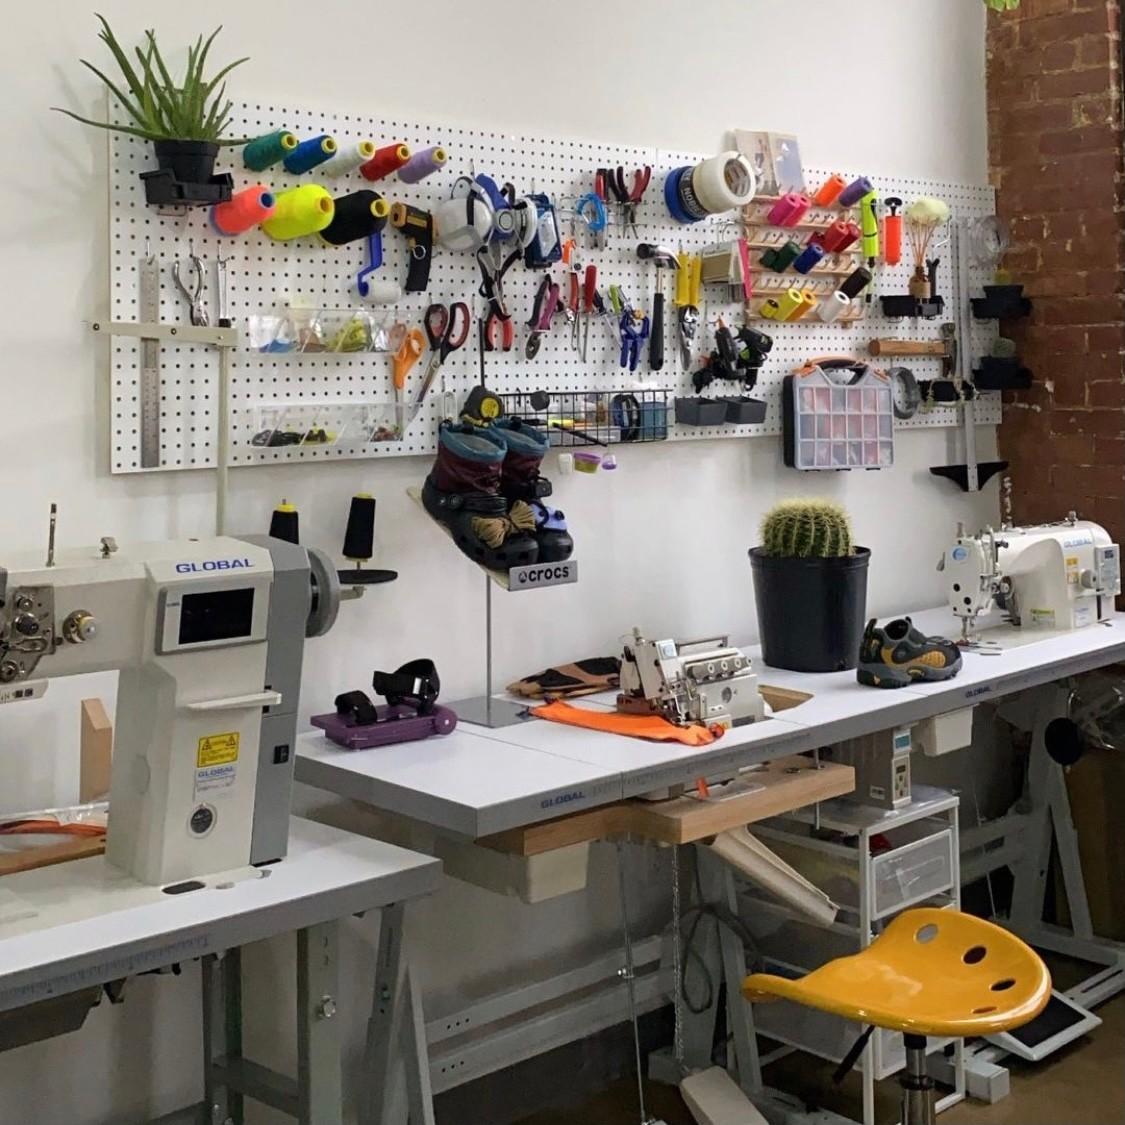 Nicole McLaughlin's workspace